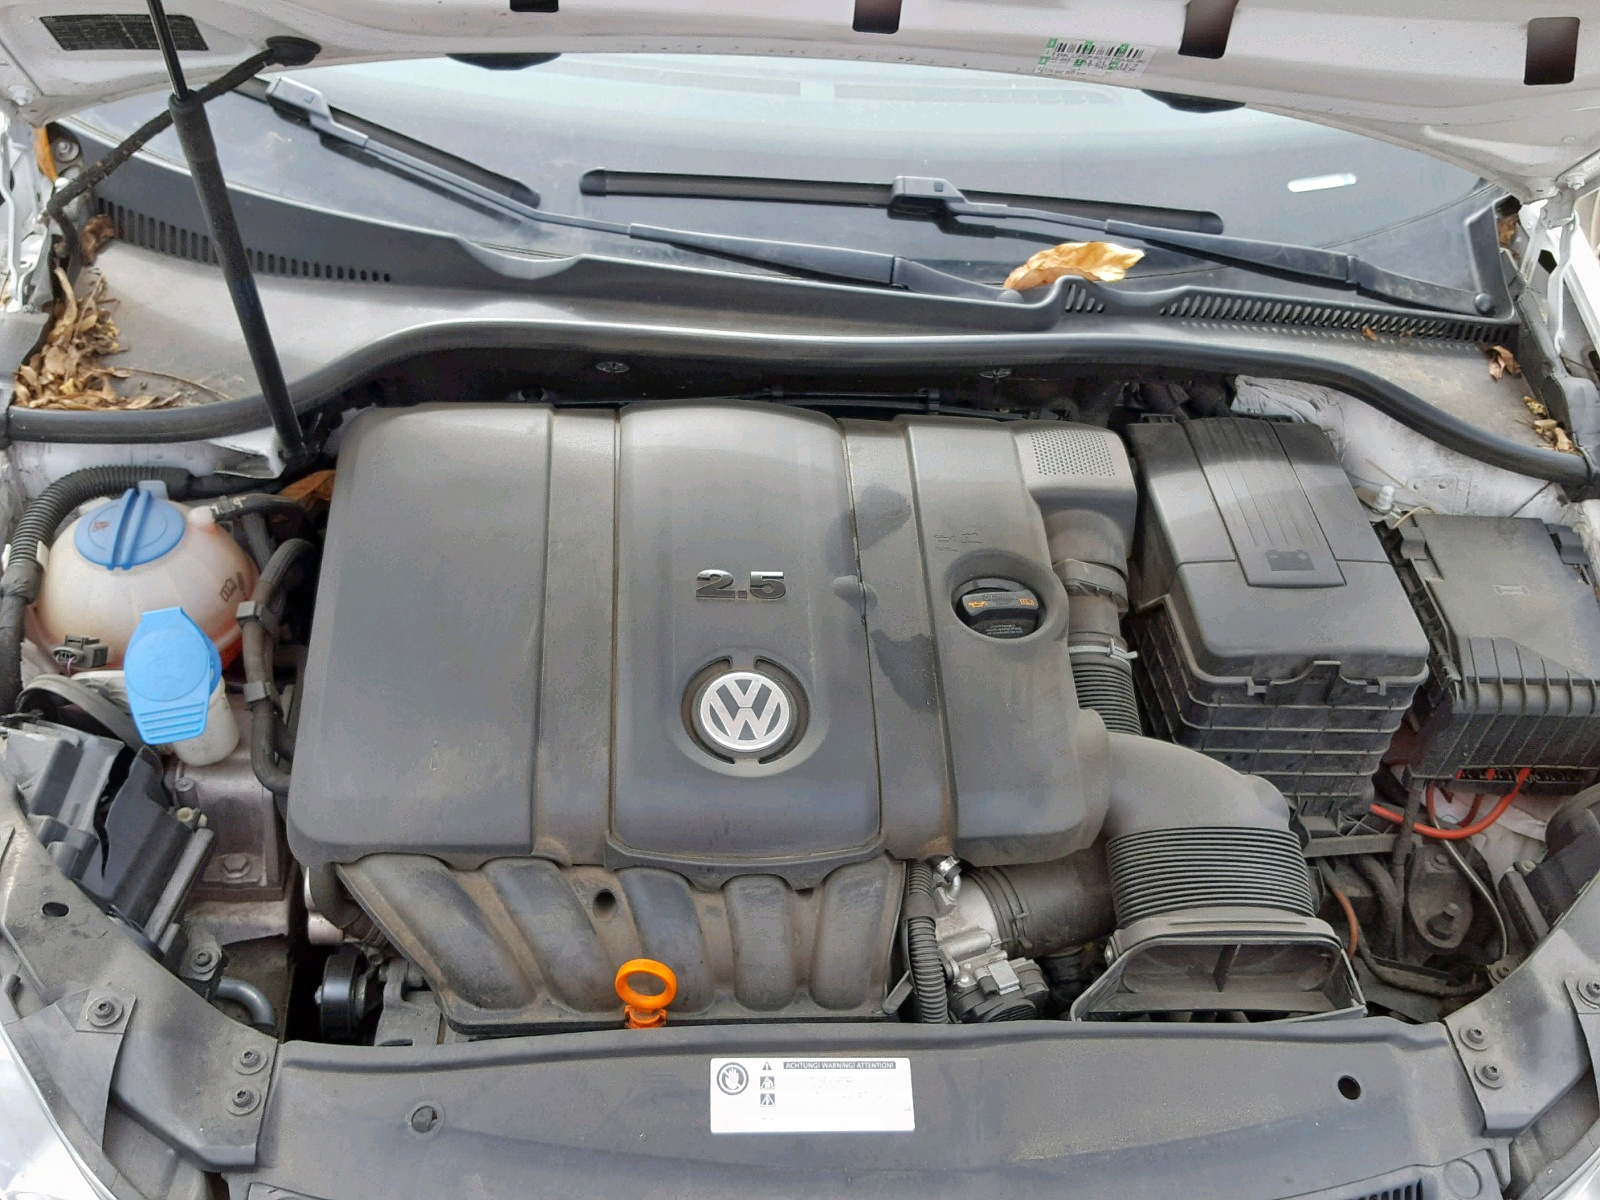 2011 Volkswagen Jetta S 2 5L 5 in CA - San Jose